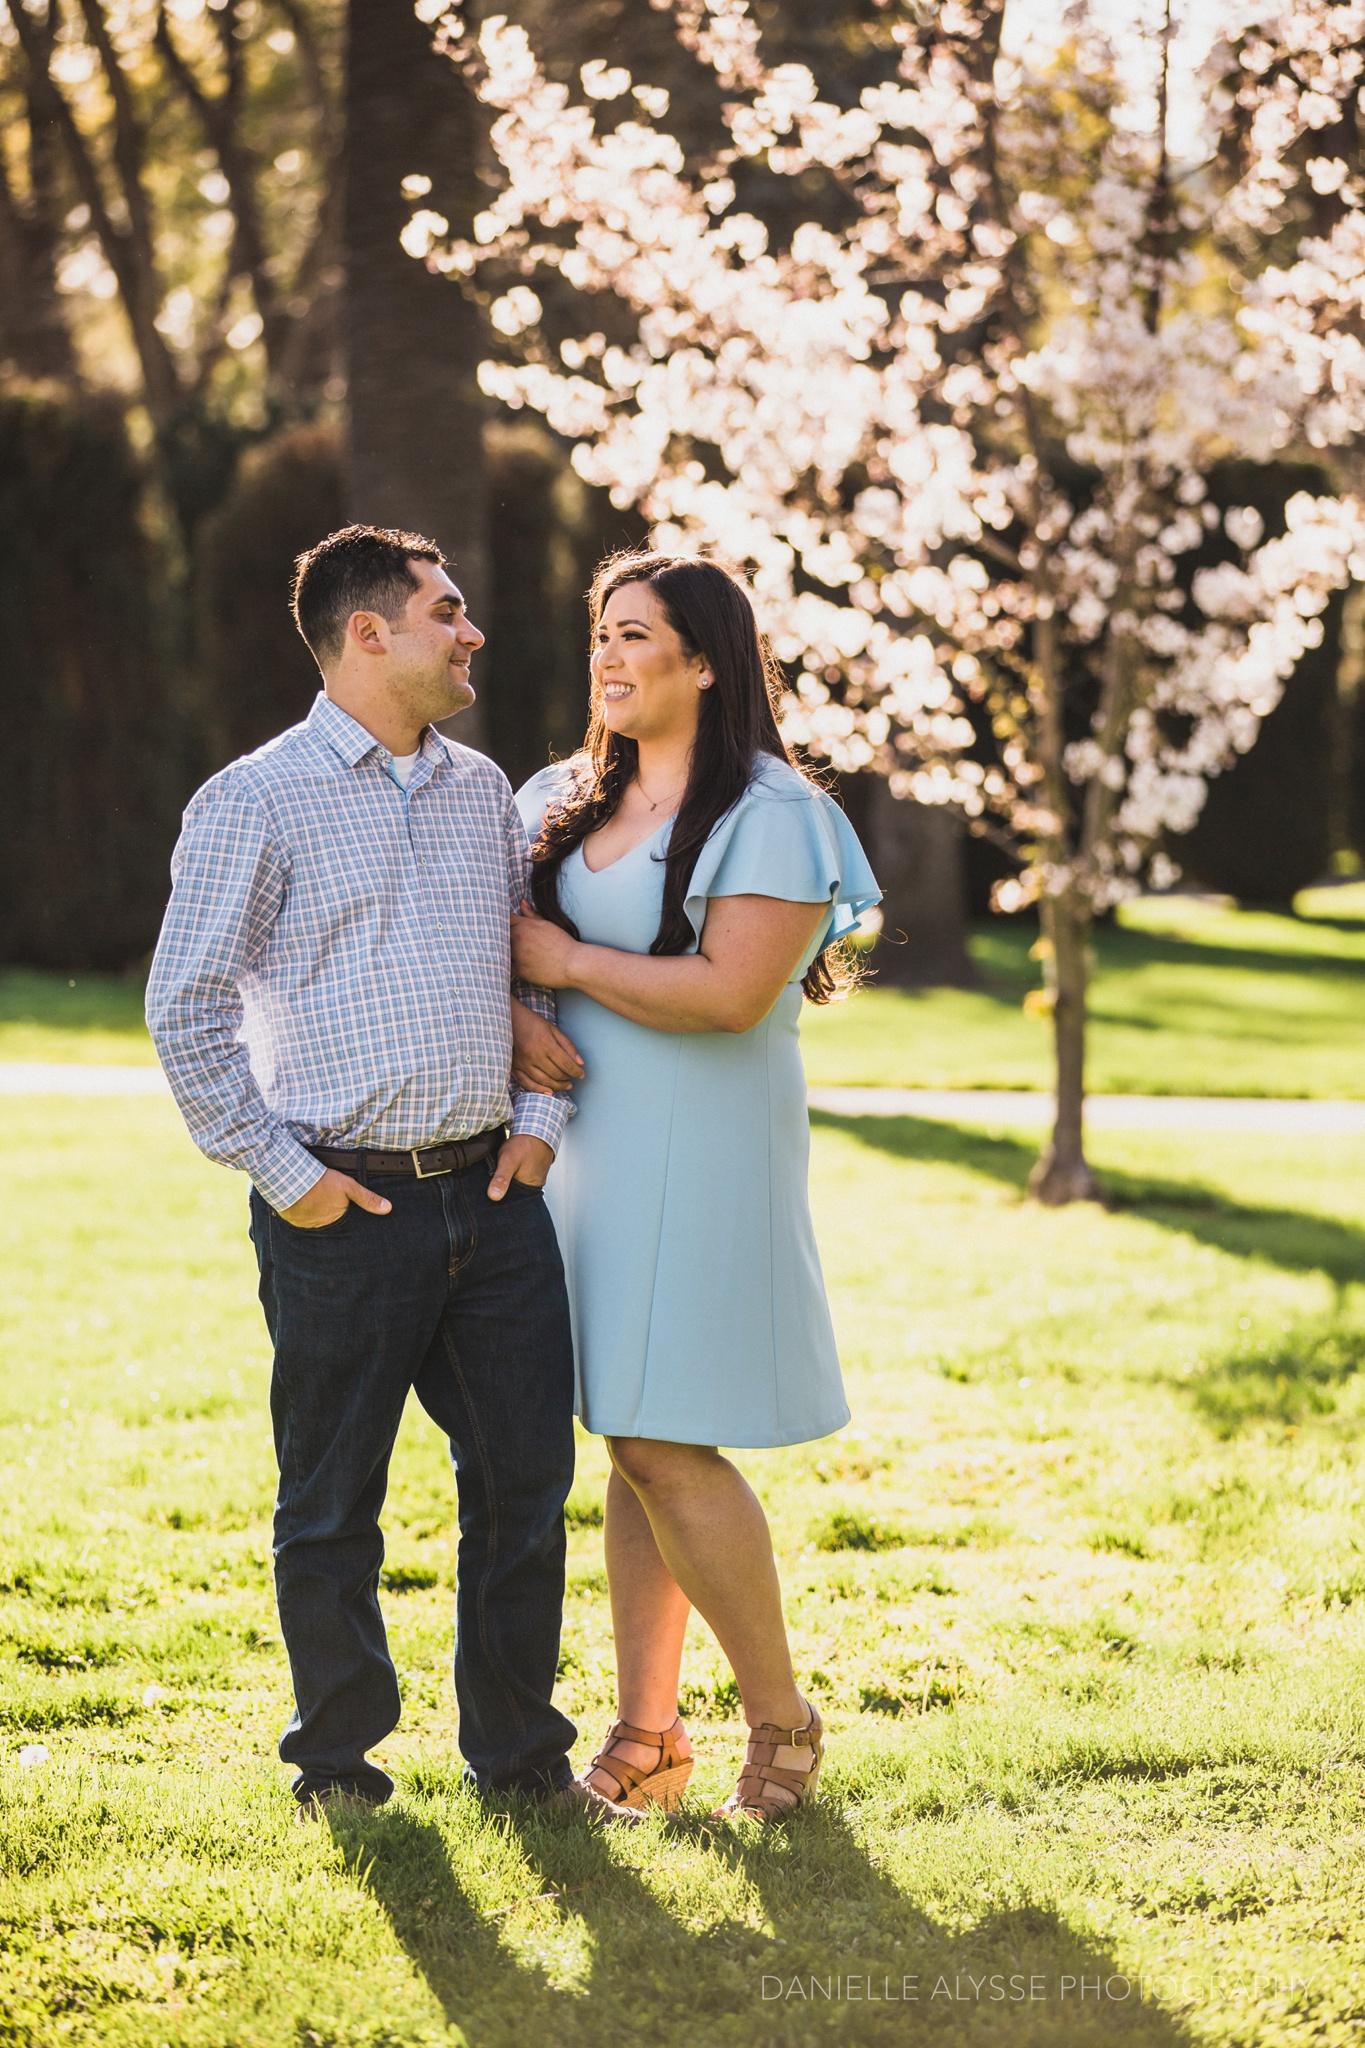 180324_engagement_lily_danielle_alysse_photography_downtown_sacramento_wedding_photographer_blog_20_WEB.jpg